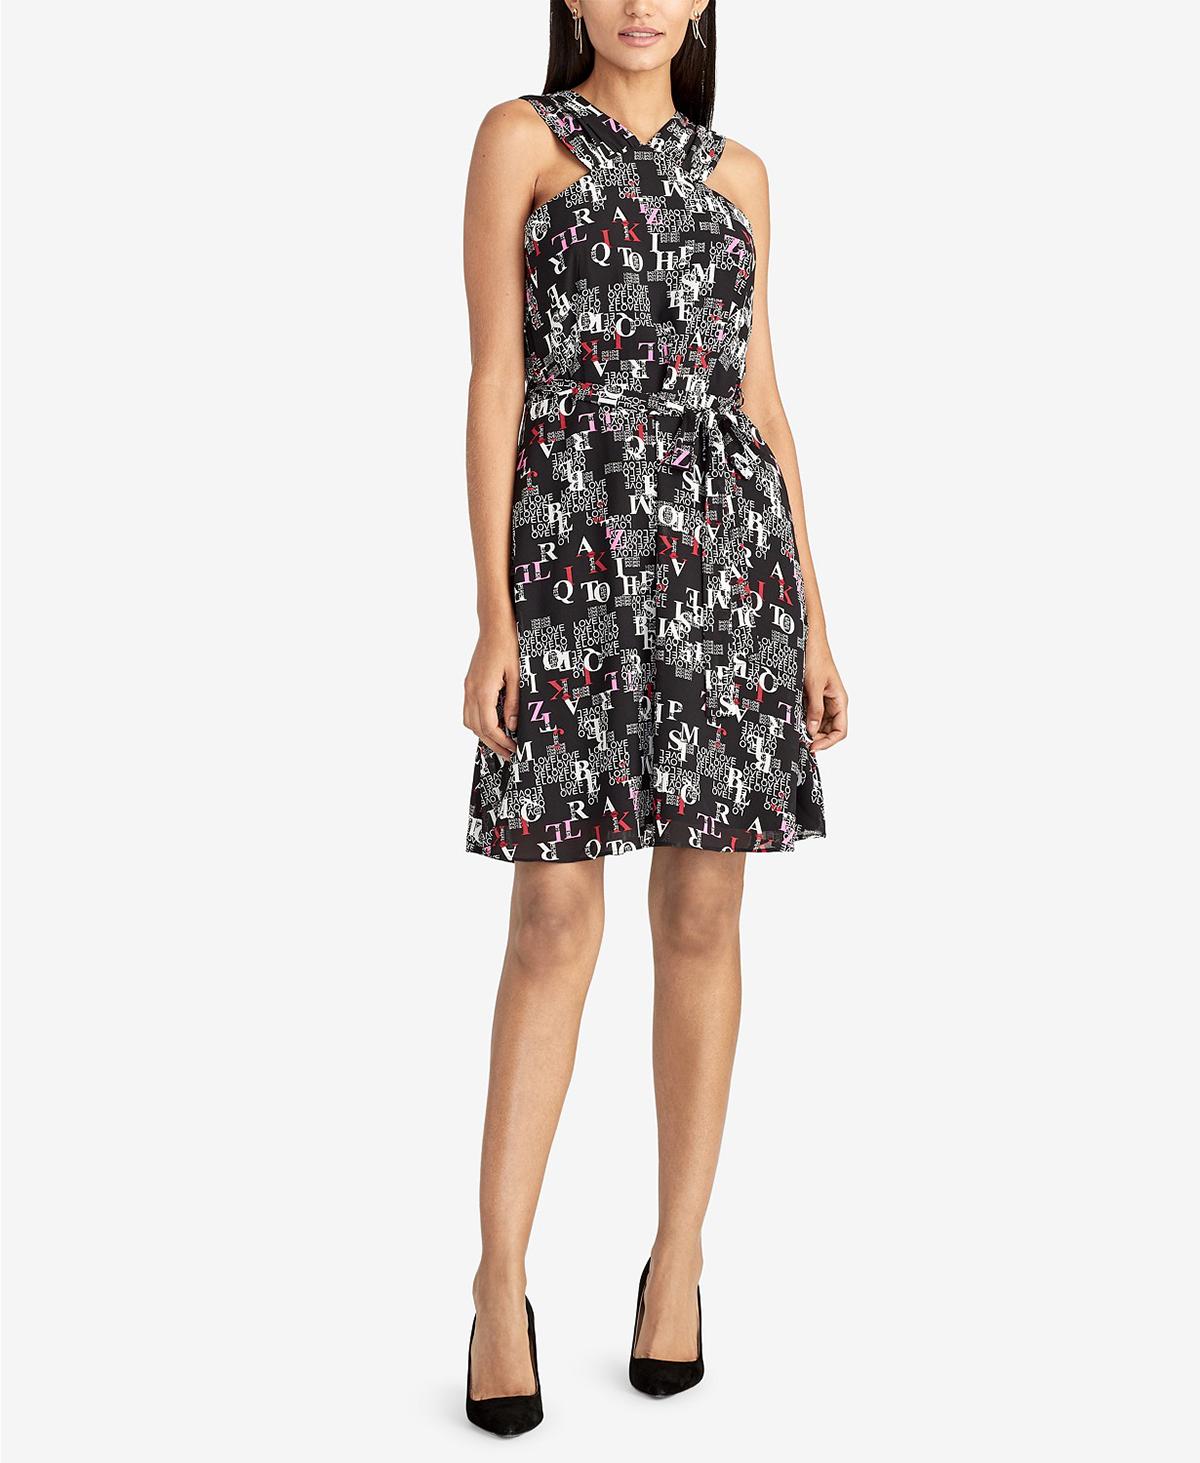 text-print-dress